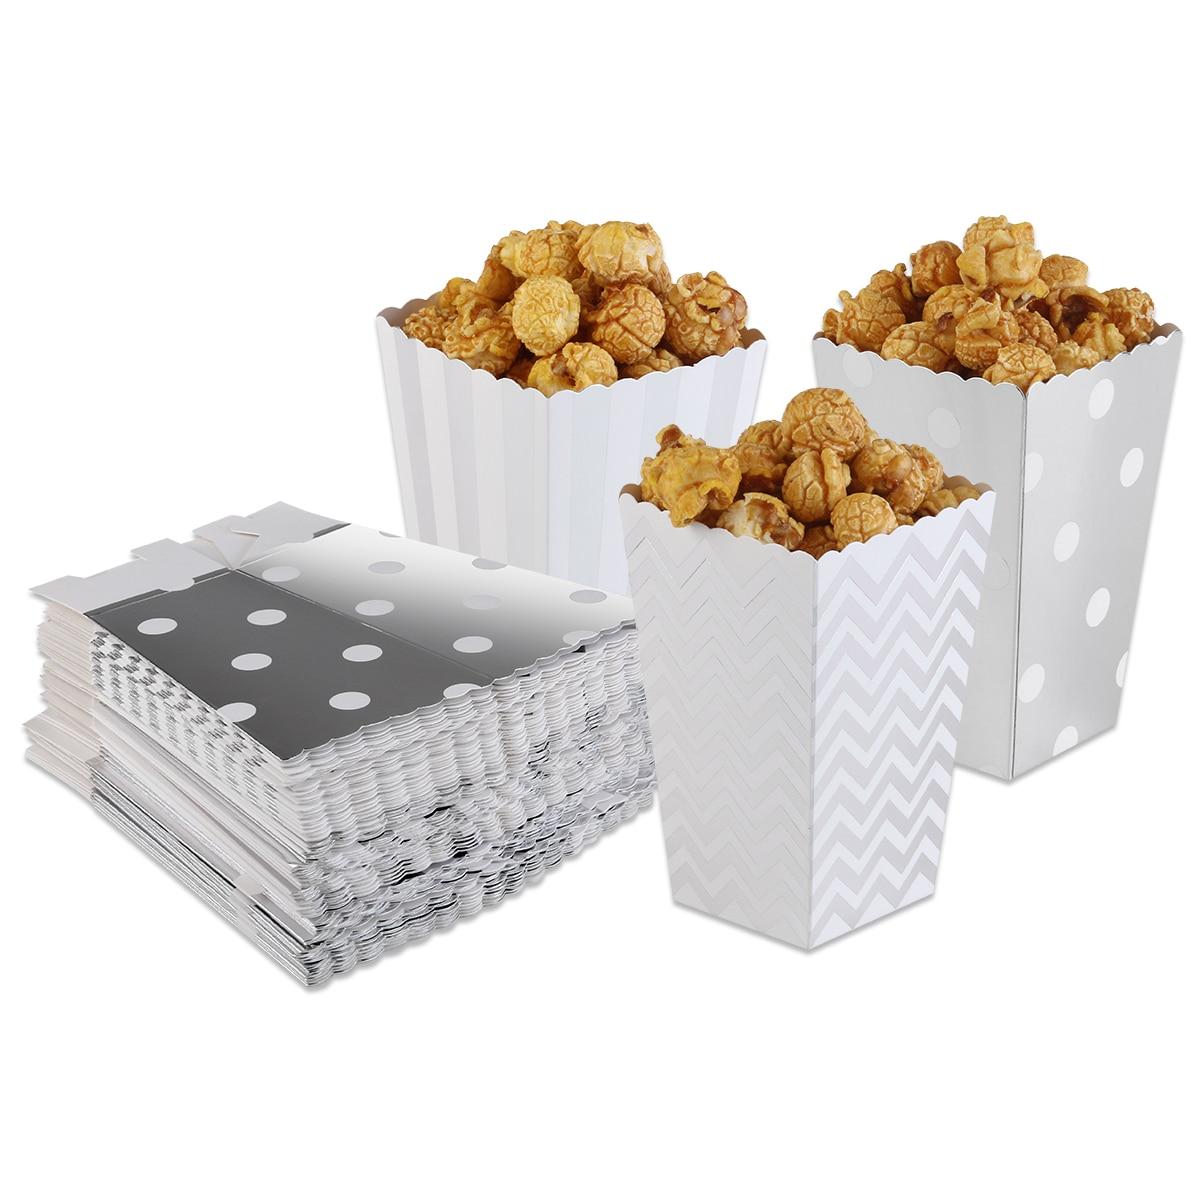 50pcs Popcorn Boxes Yellow Design Trio Miniature Scalloped Edge Cardboard Party CartonsCandy/Sanck Bags Movie Supplies (Silver)